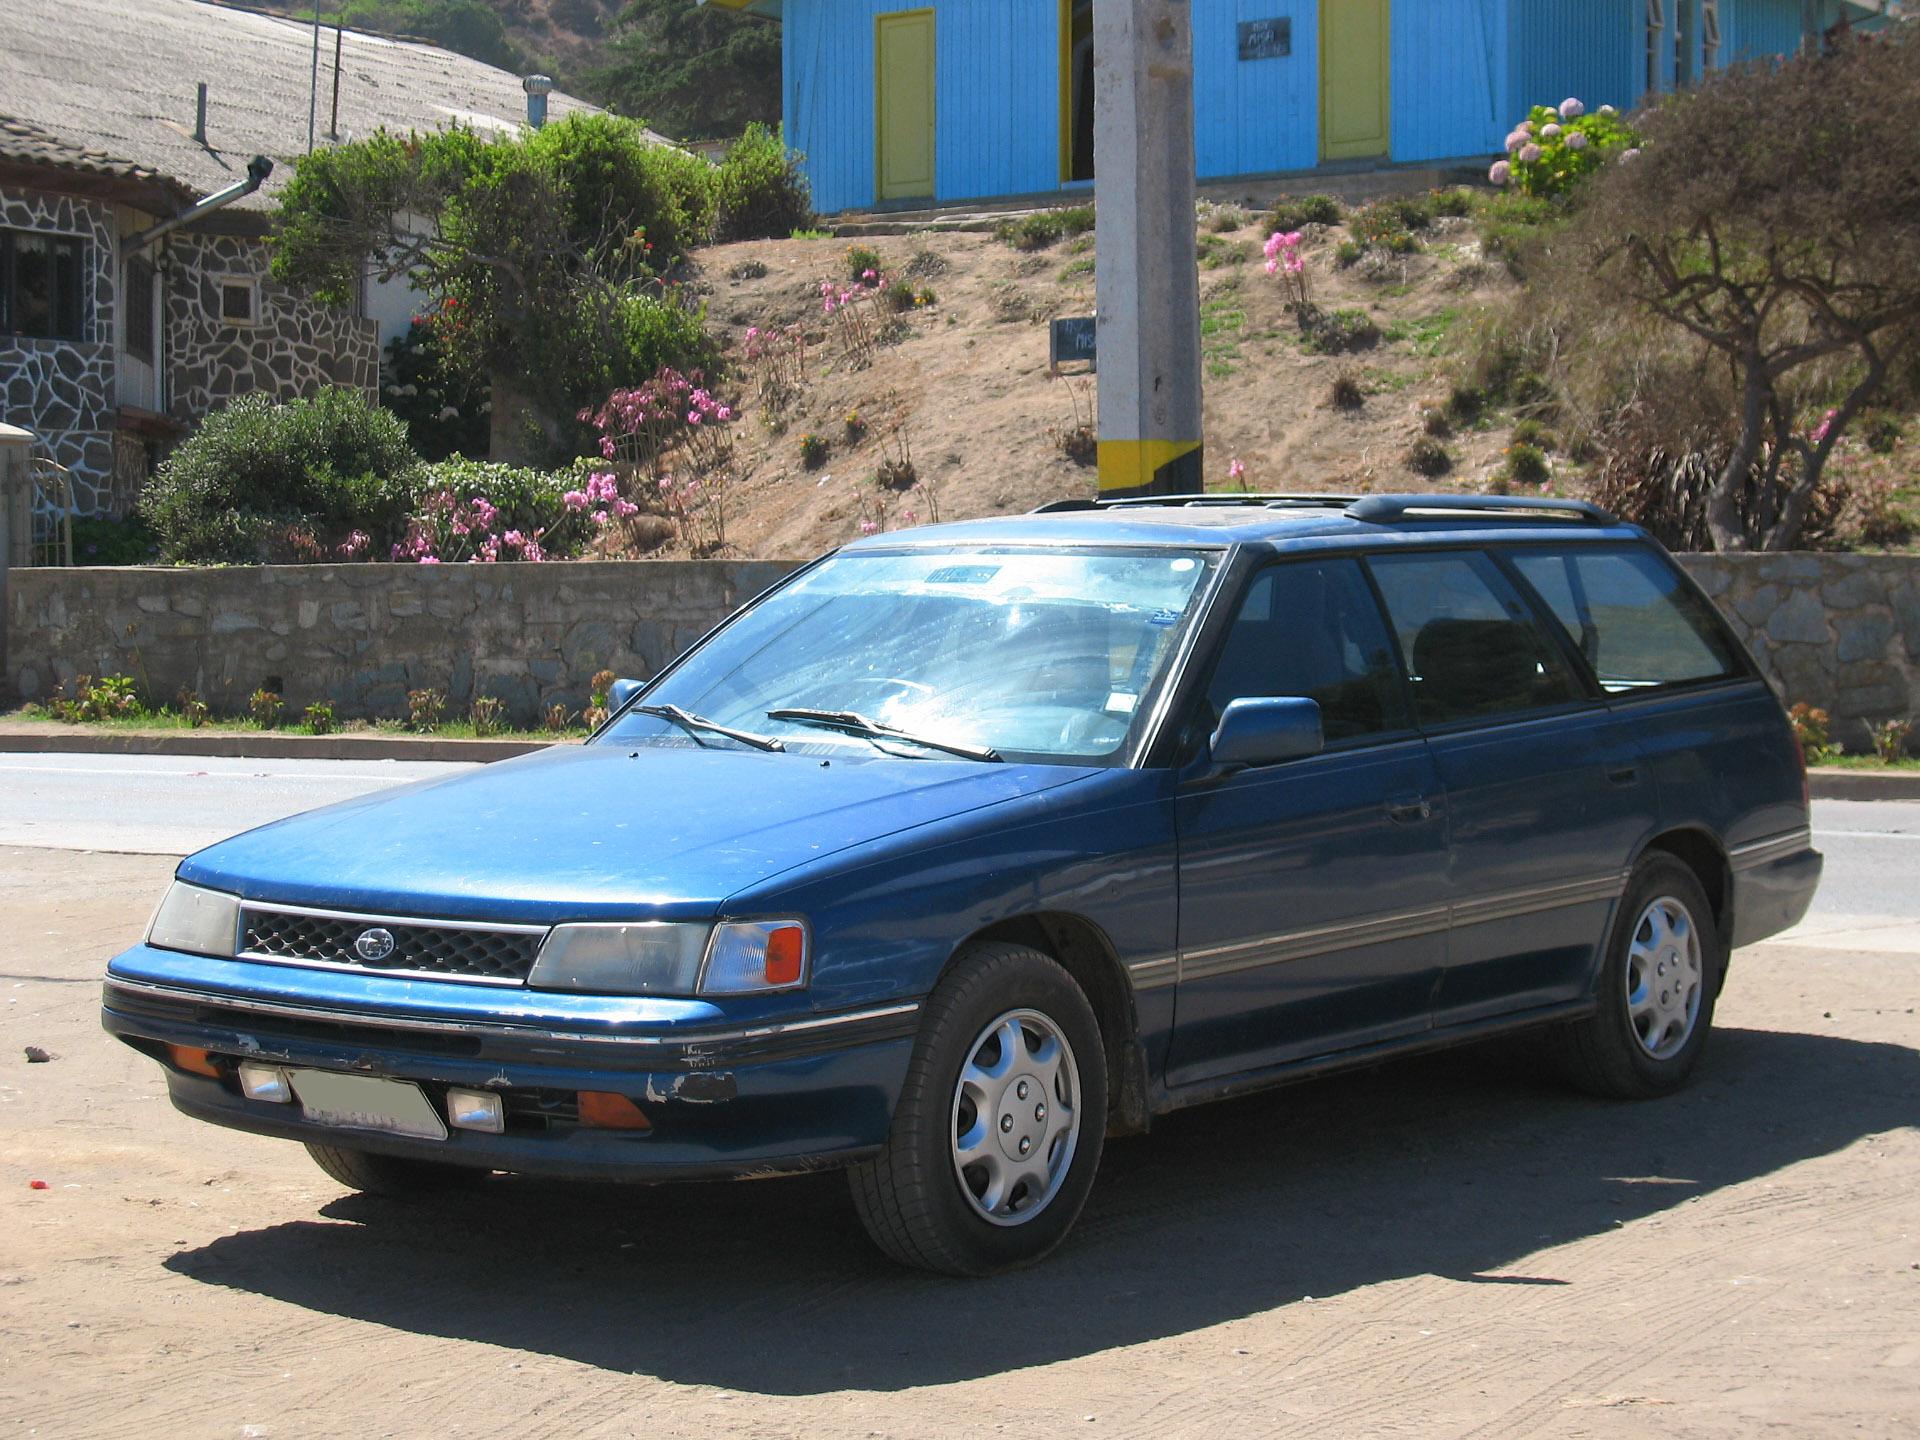 2018 Subaru Legacy Turbo >> 1990 Subaru Legacy Wagon For Sale | The Wagon